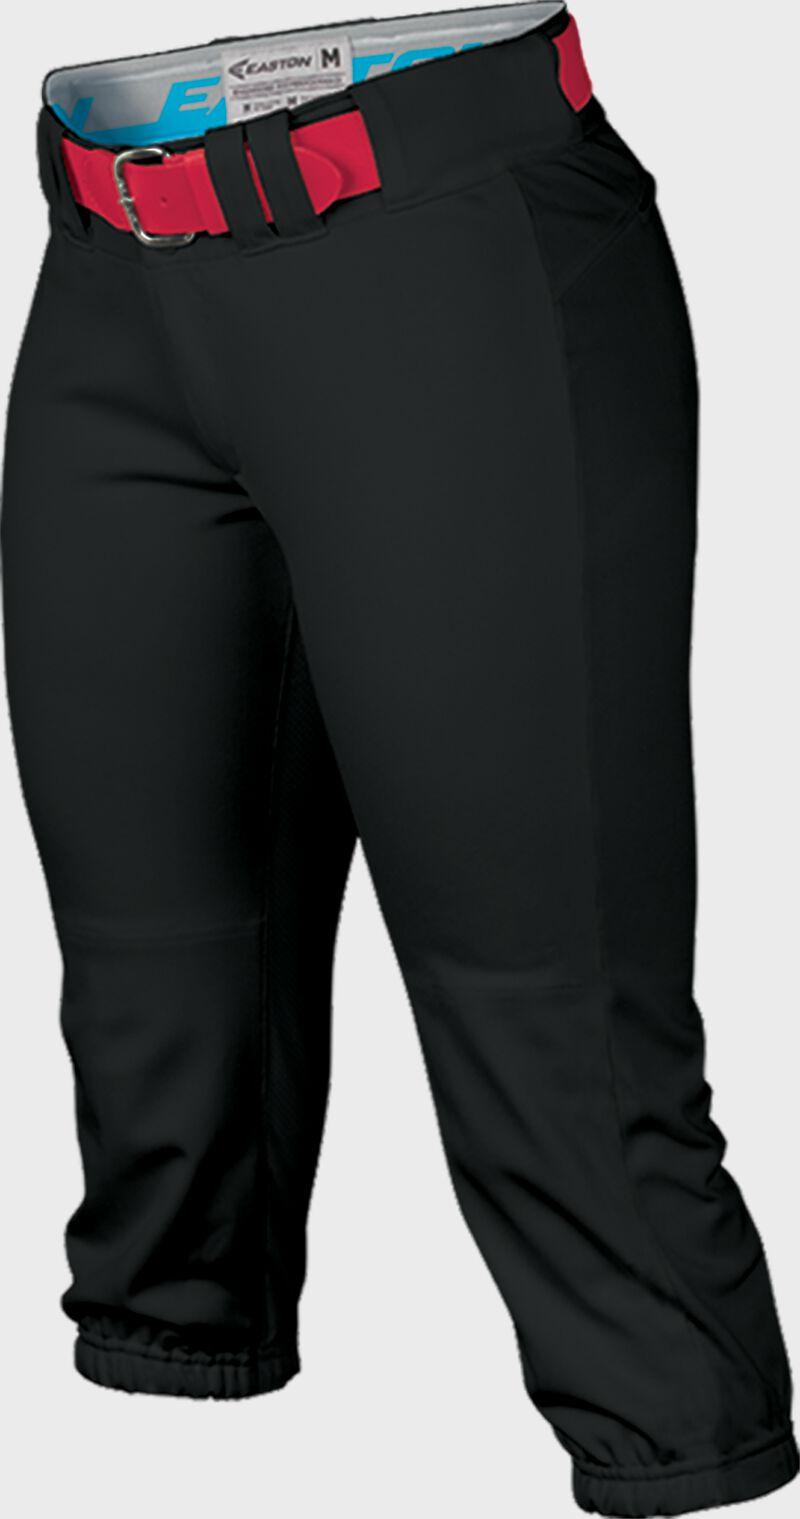 Easton Prowess Softball Pant Girls BLACK  S